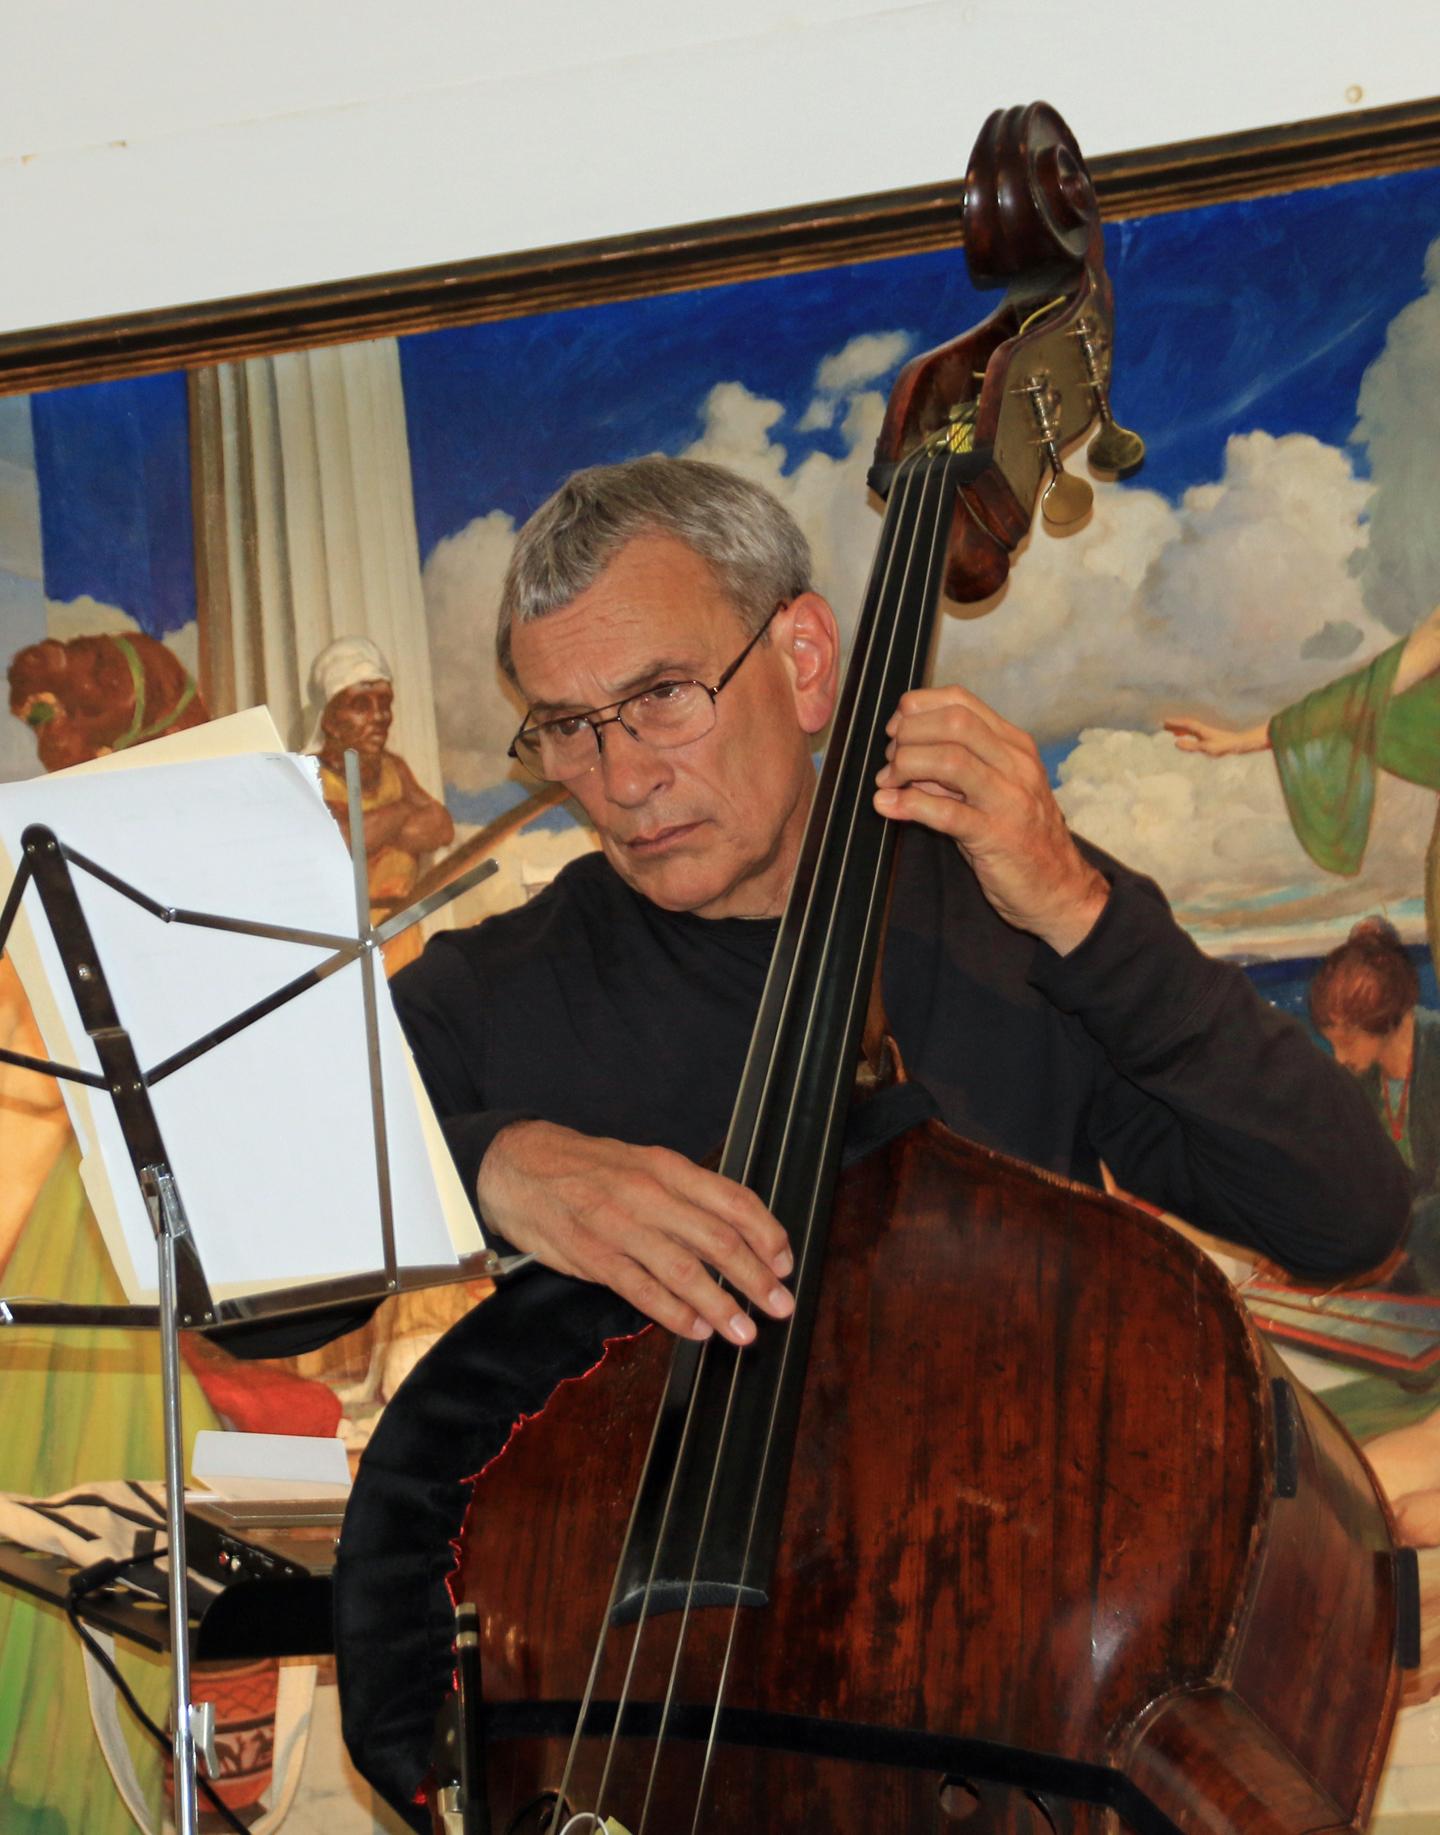 Vaughn DeForest playing acoustic bass during the August Wiscasset Art Walk. (photo by Diann Longstreet)